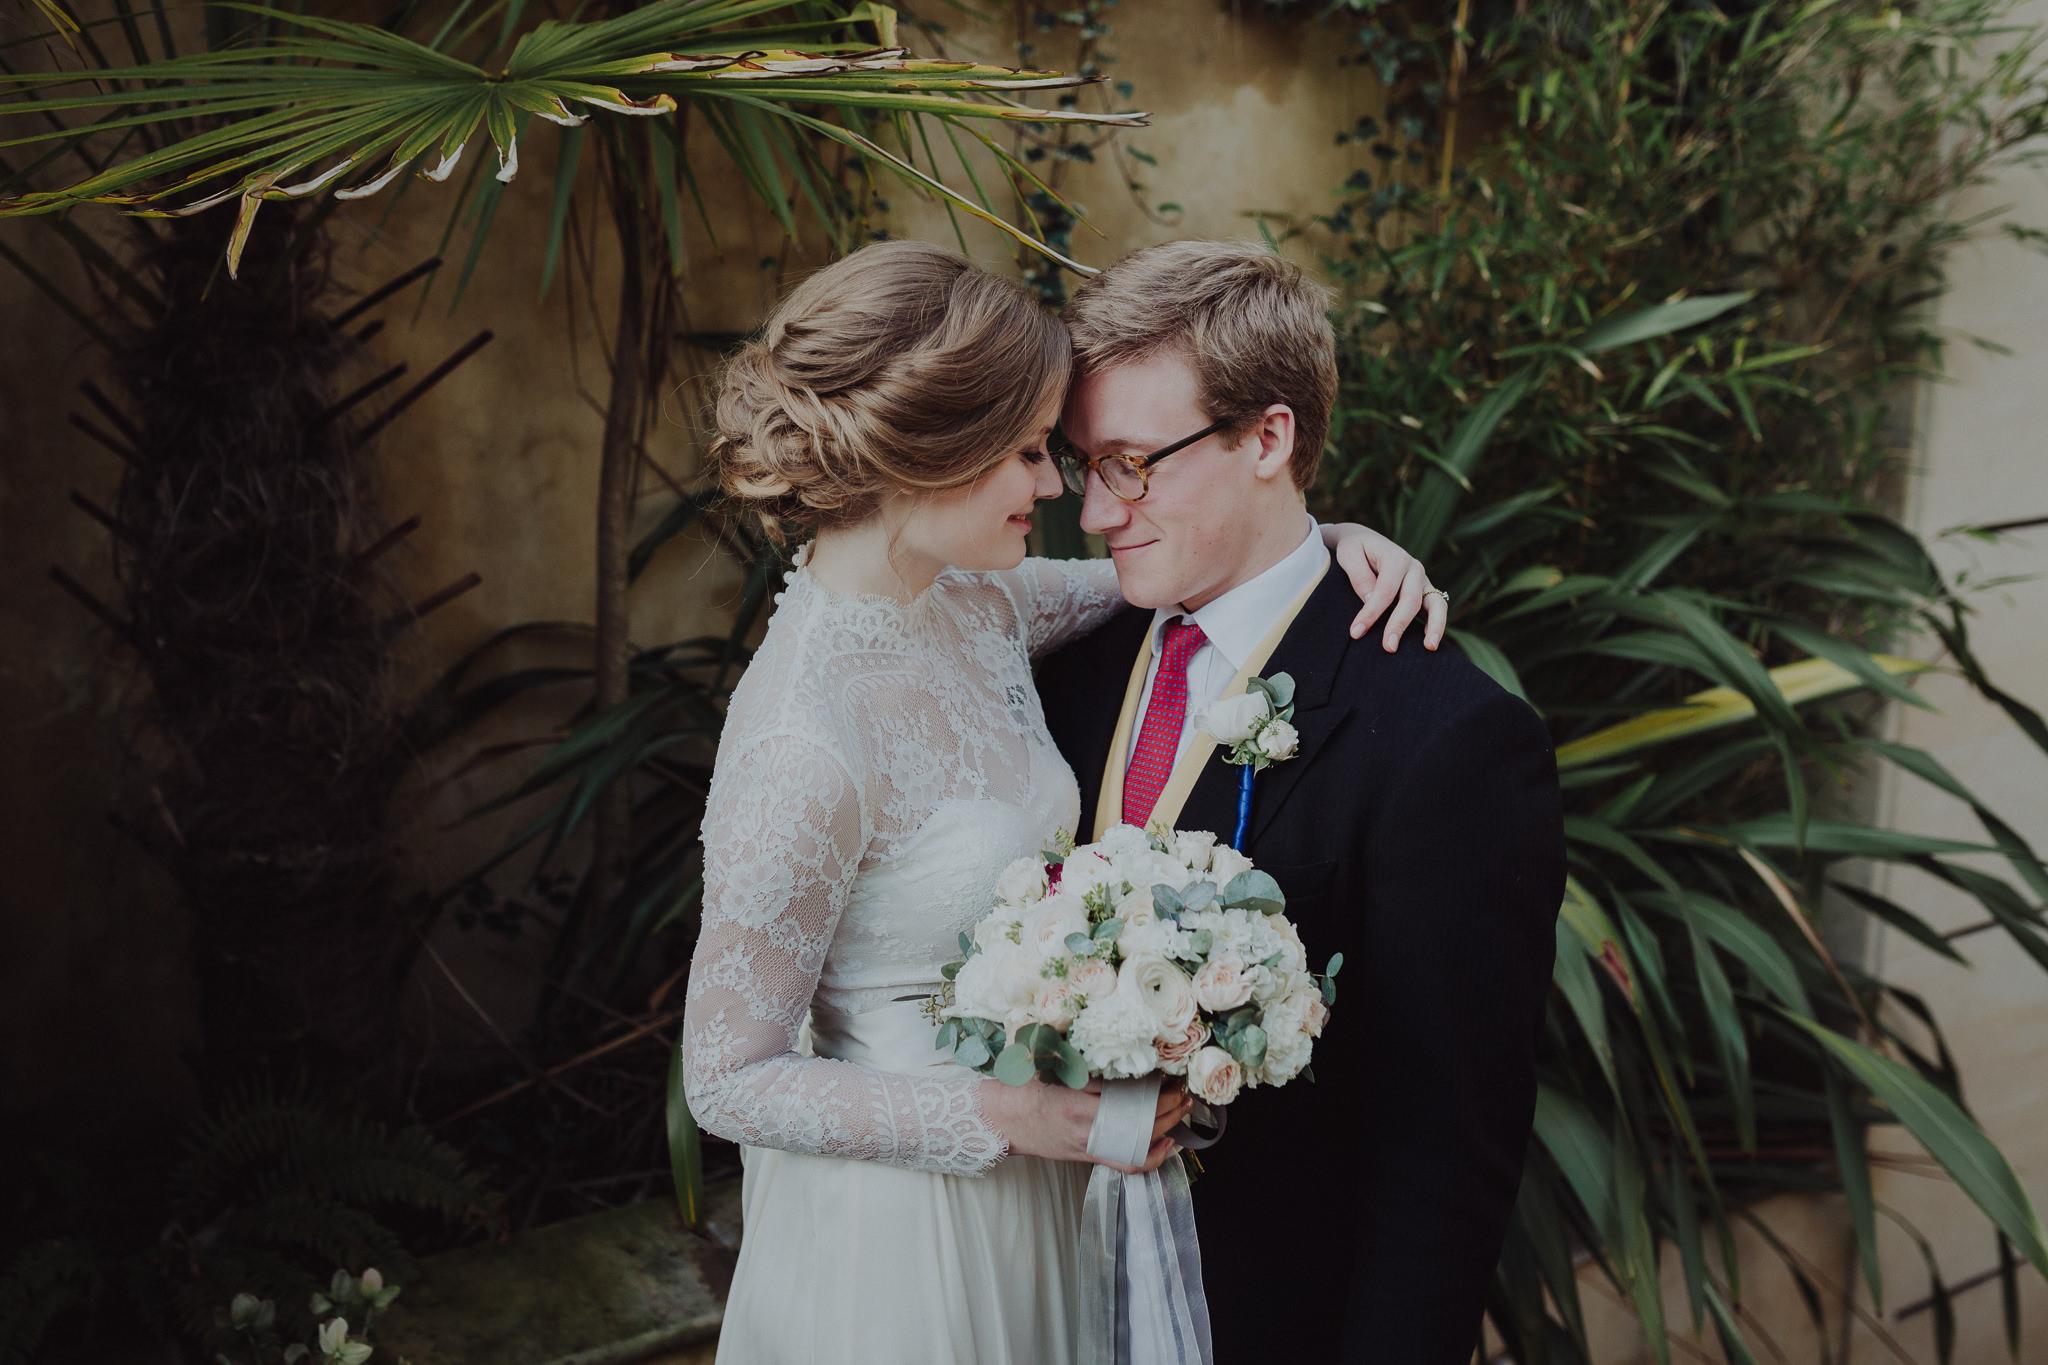 hampstead_wedding_photography_kate_gray-16.jpg